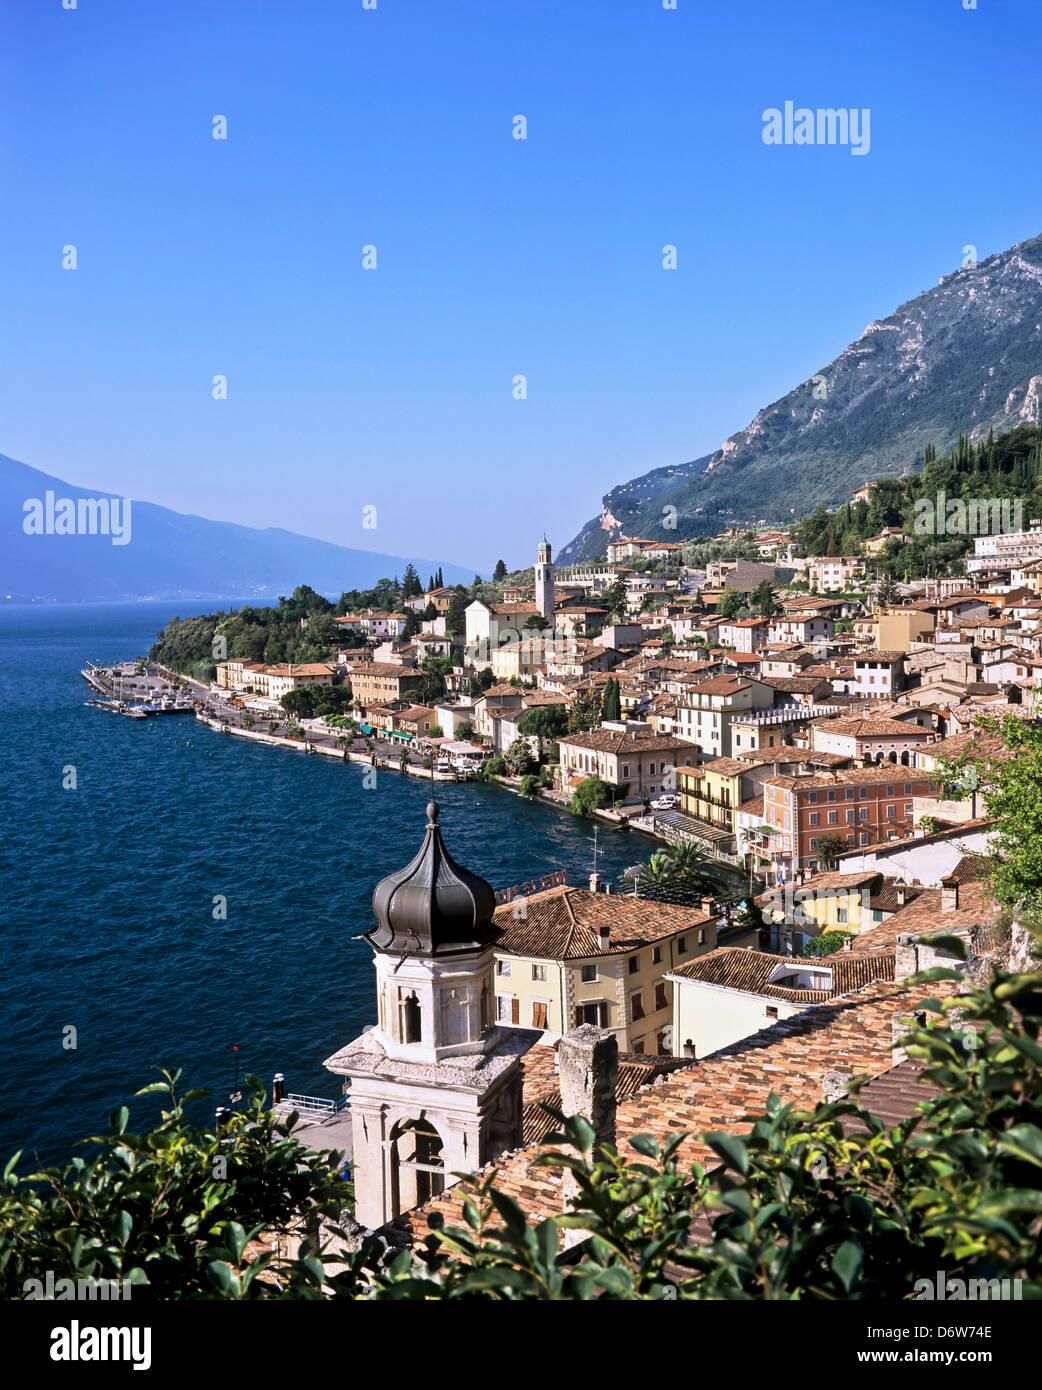 8441. Limone, Lake Garda, Trentino Alto Adirge, Italy, Europe - Stock Image